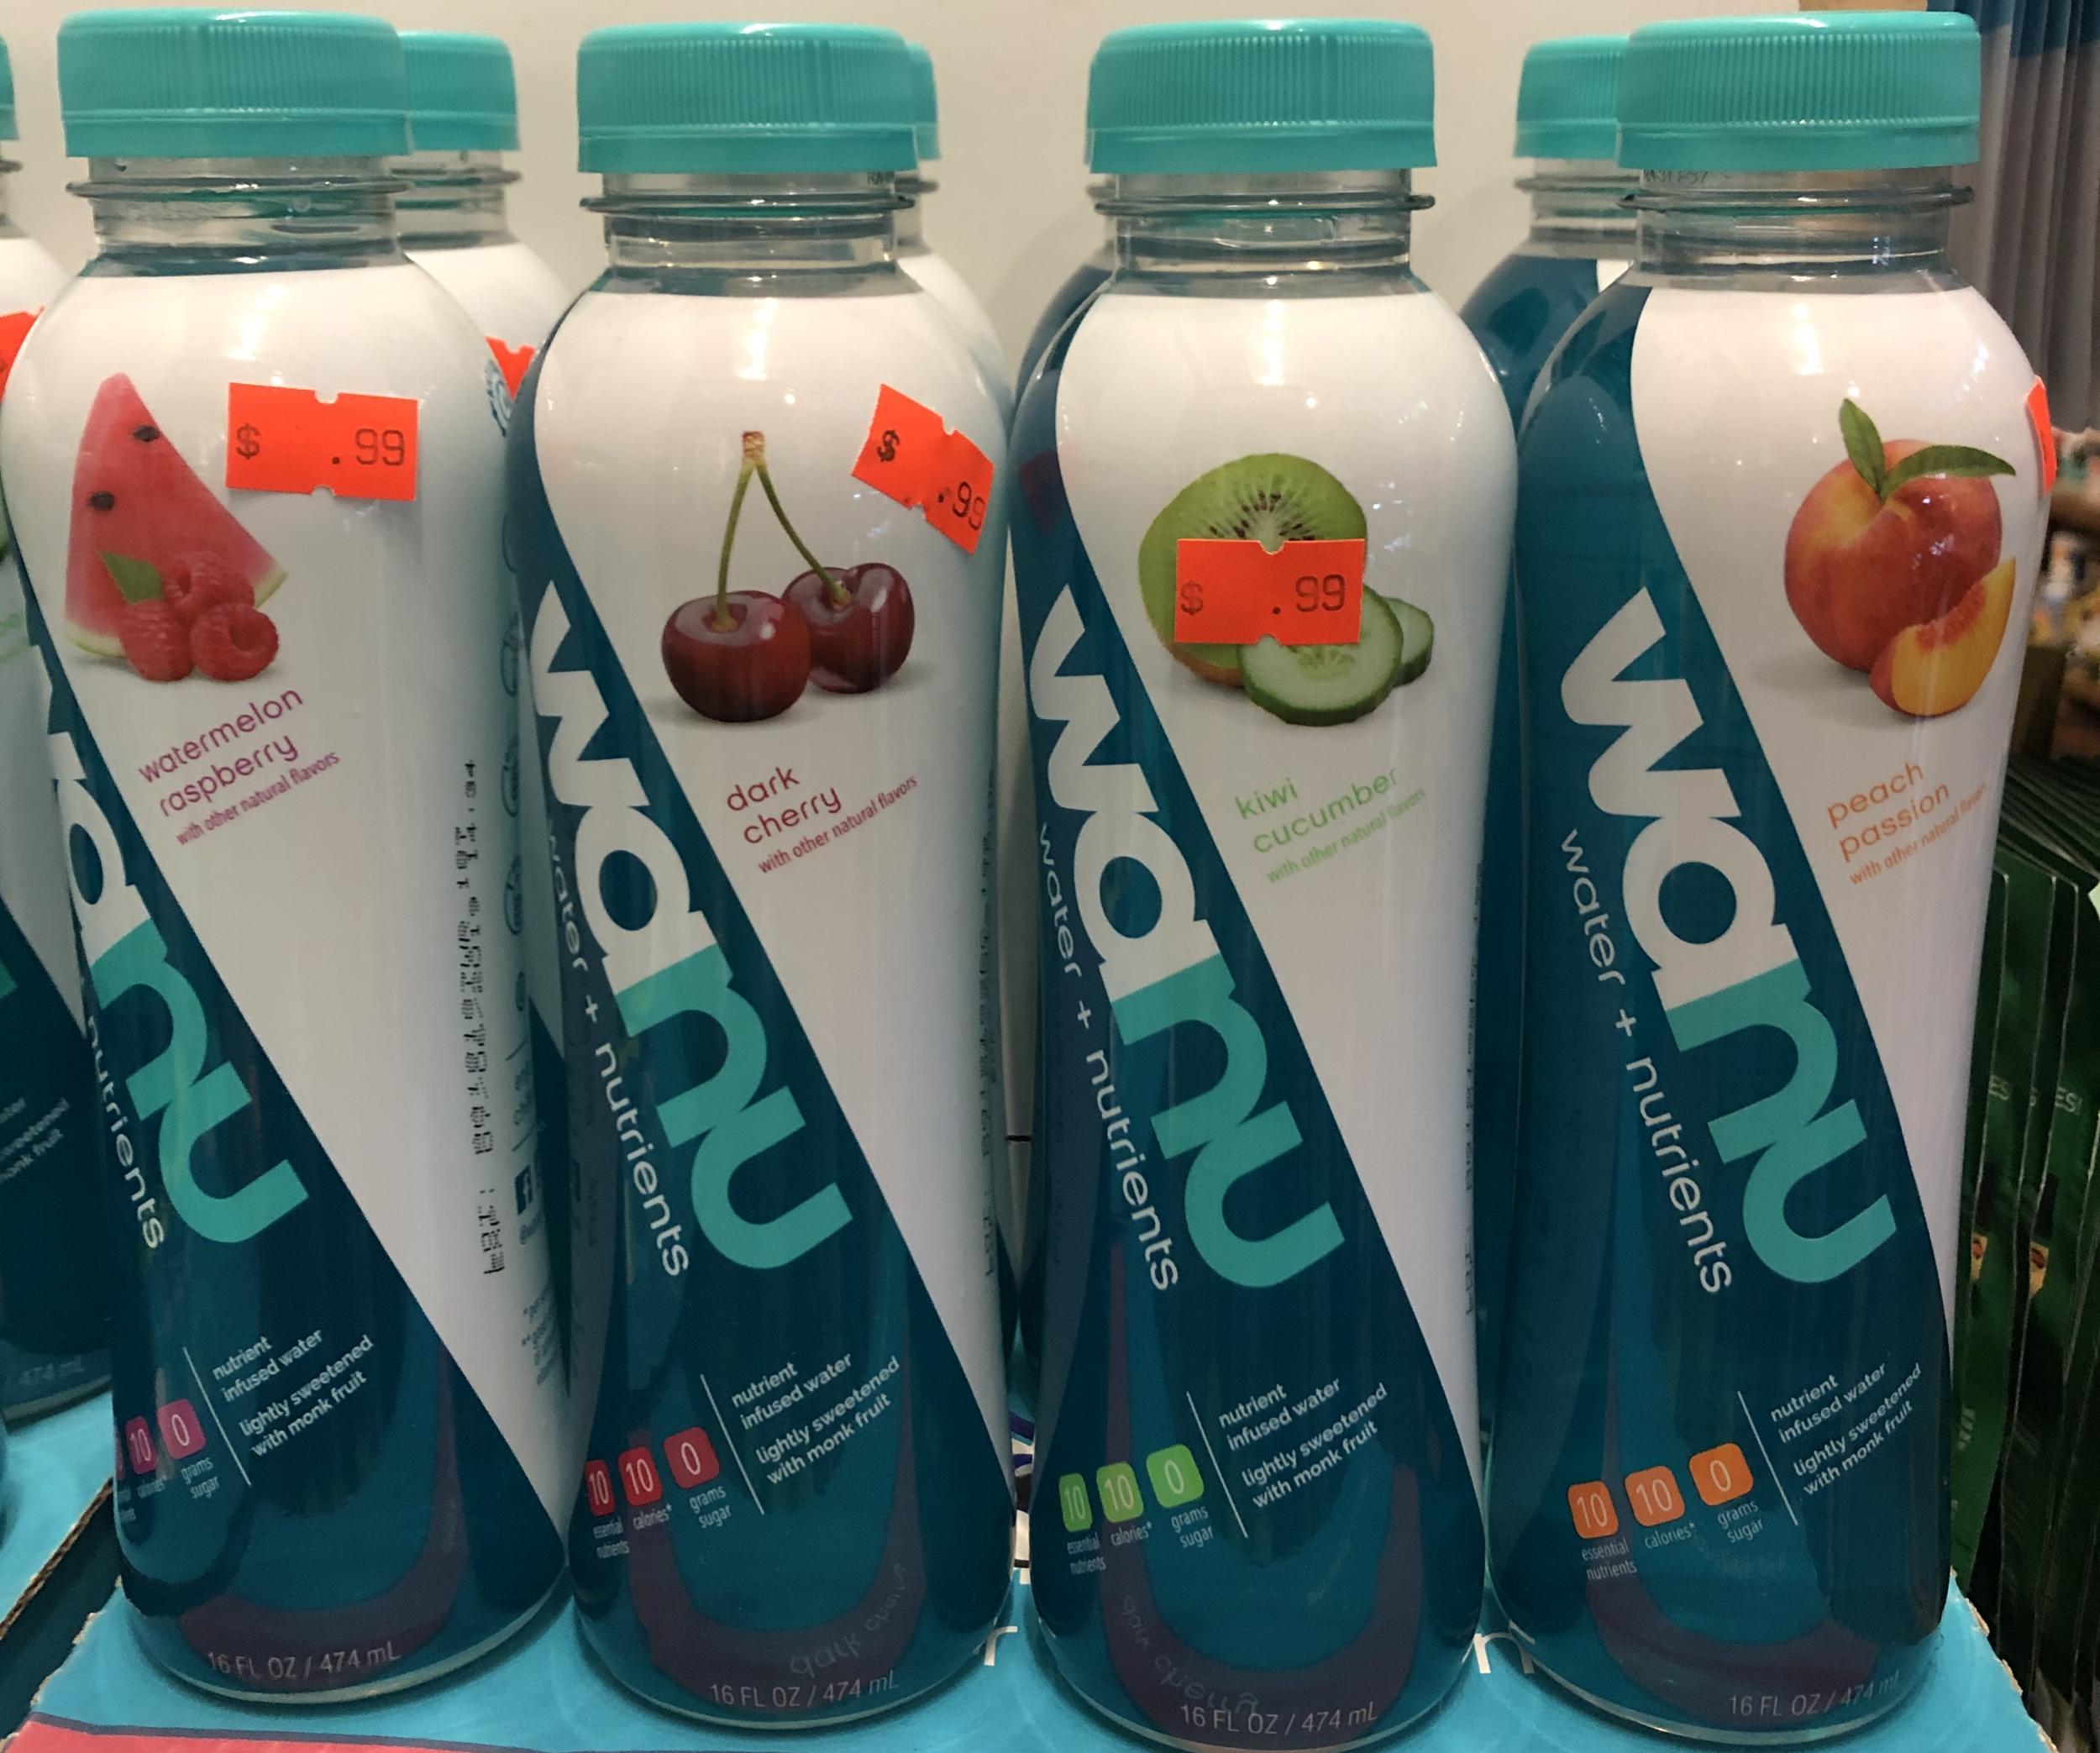 Wanu Water + Nutrients - Watermelon Raspberry, Dark Cherry, Kiwi Cucumber & Peach Passion